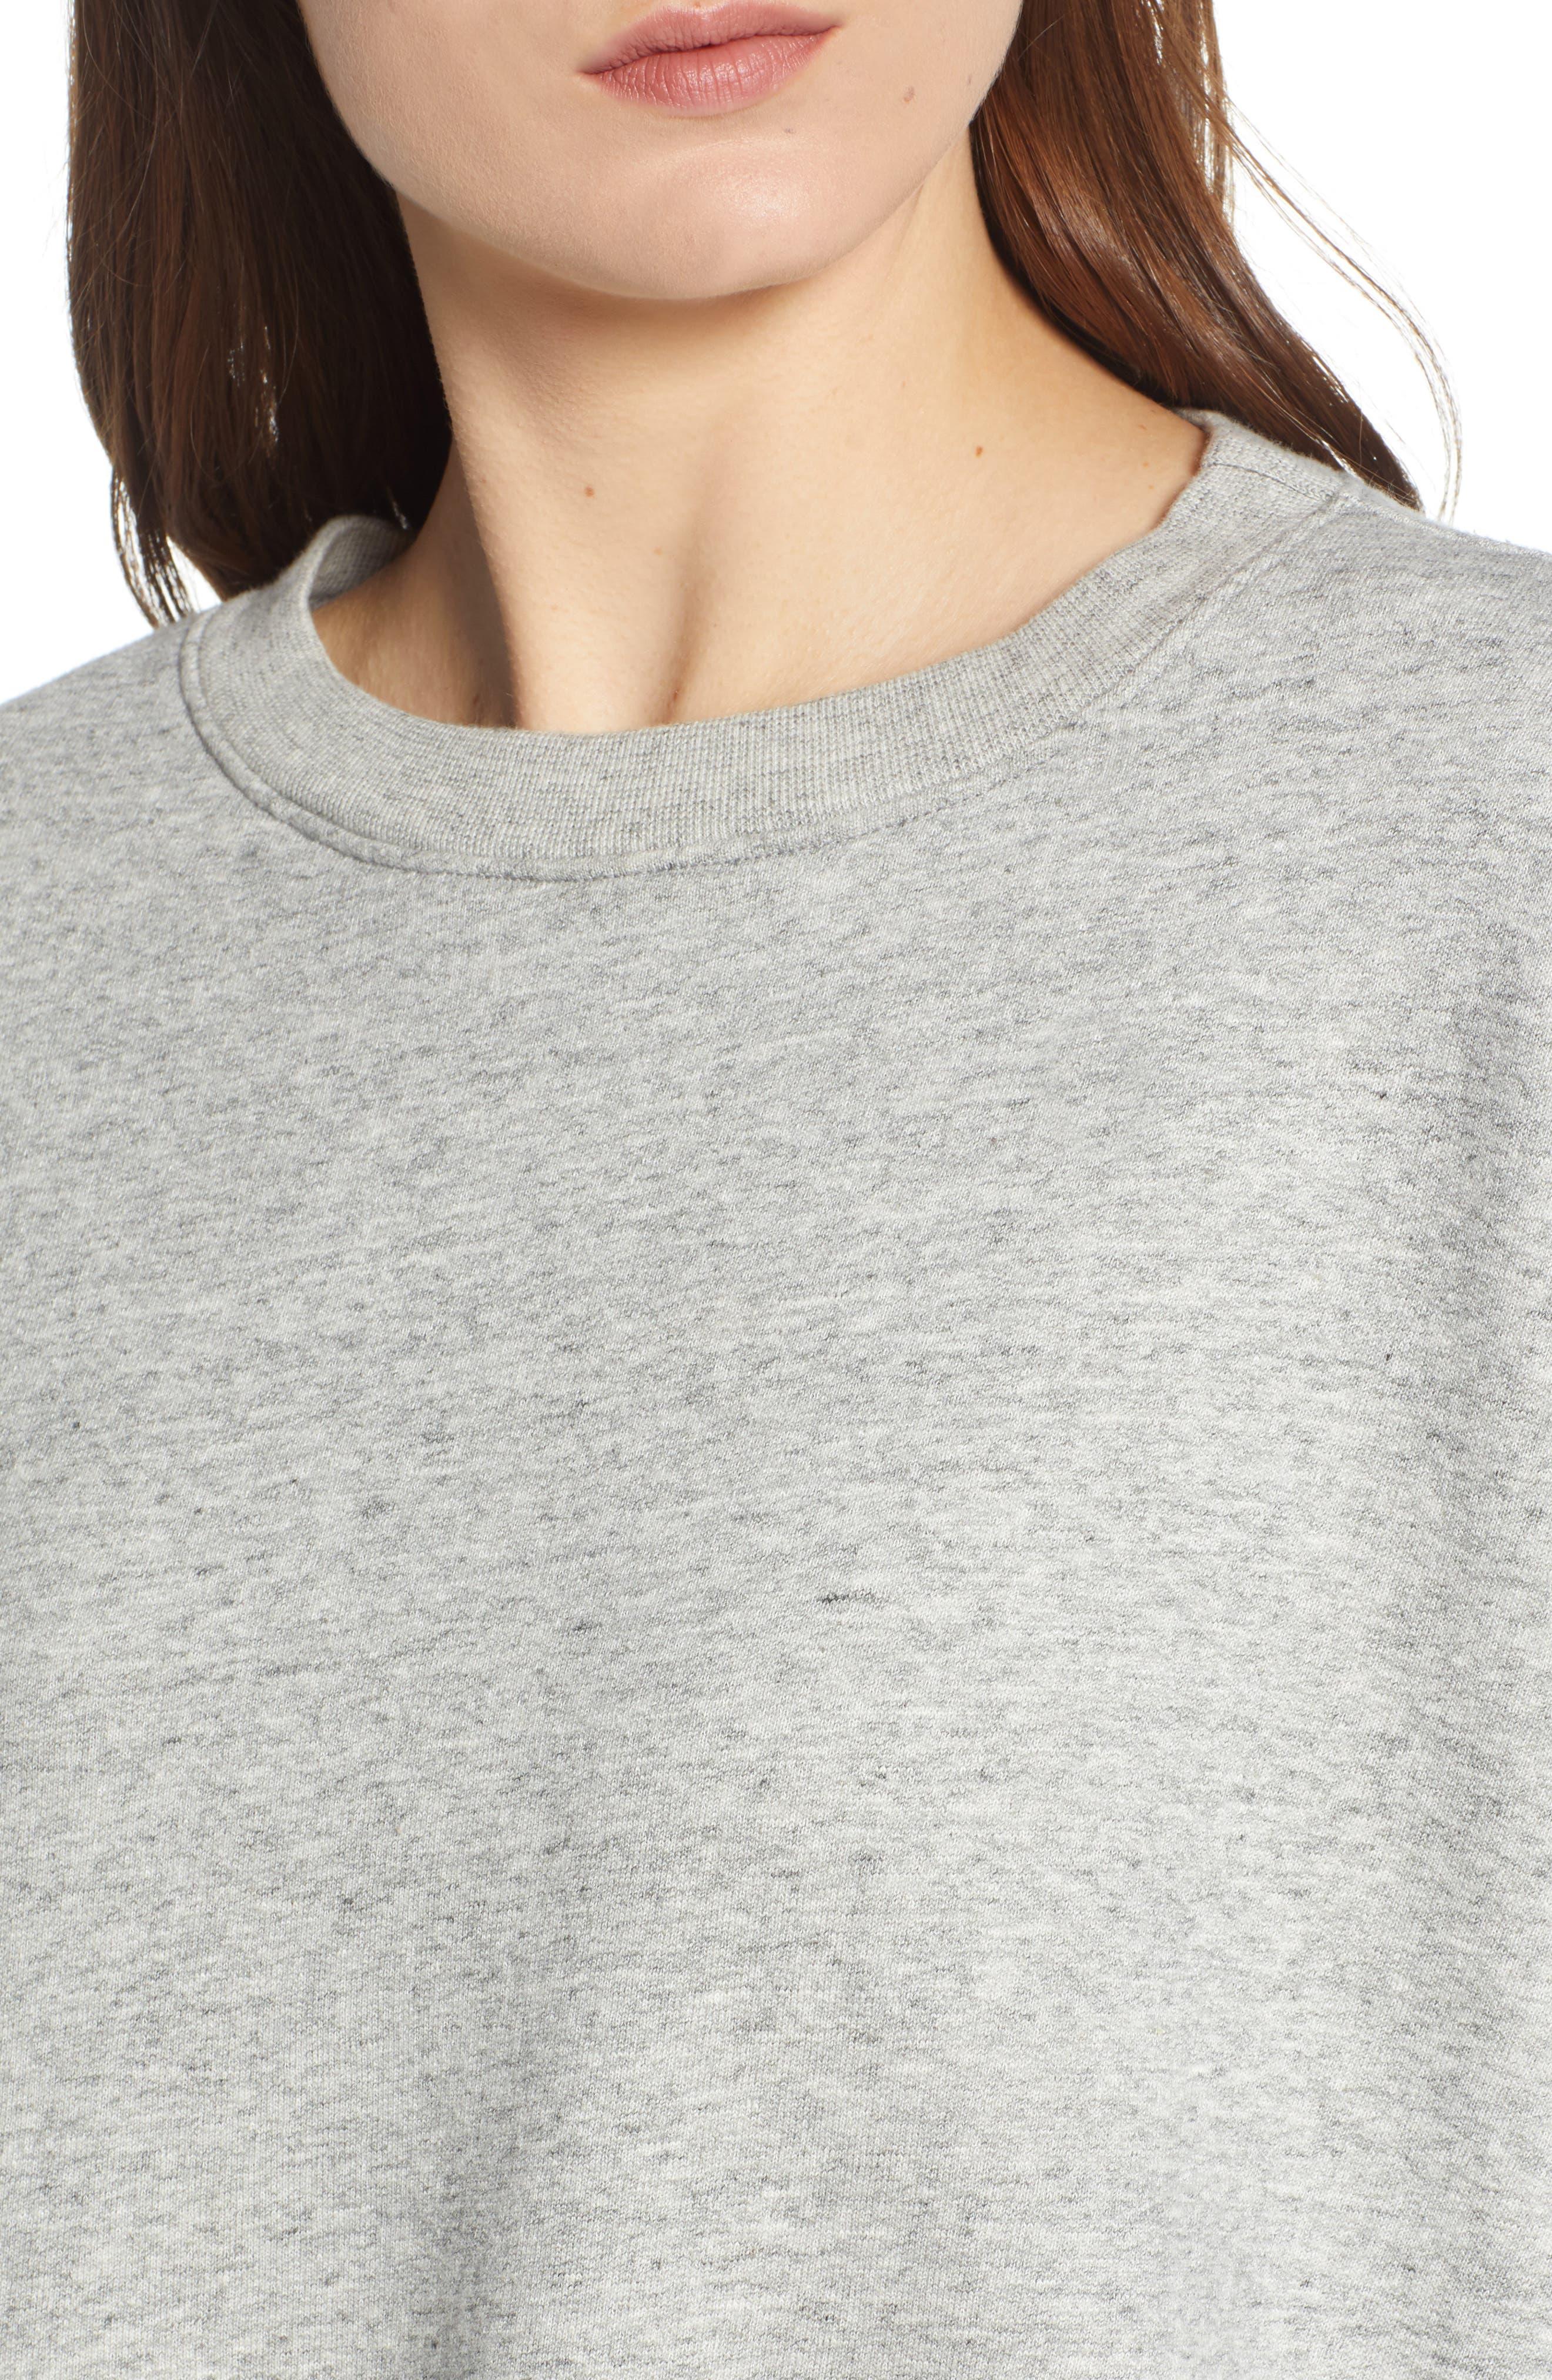 Berdine Oversize Sweatshirt,                             Alternate thumbnail 4, color,                             HEATHER GREY